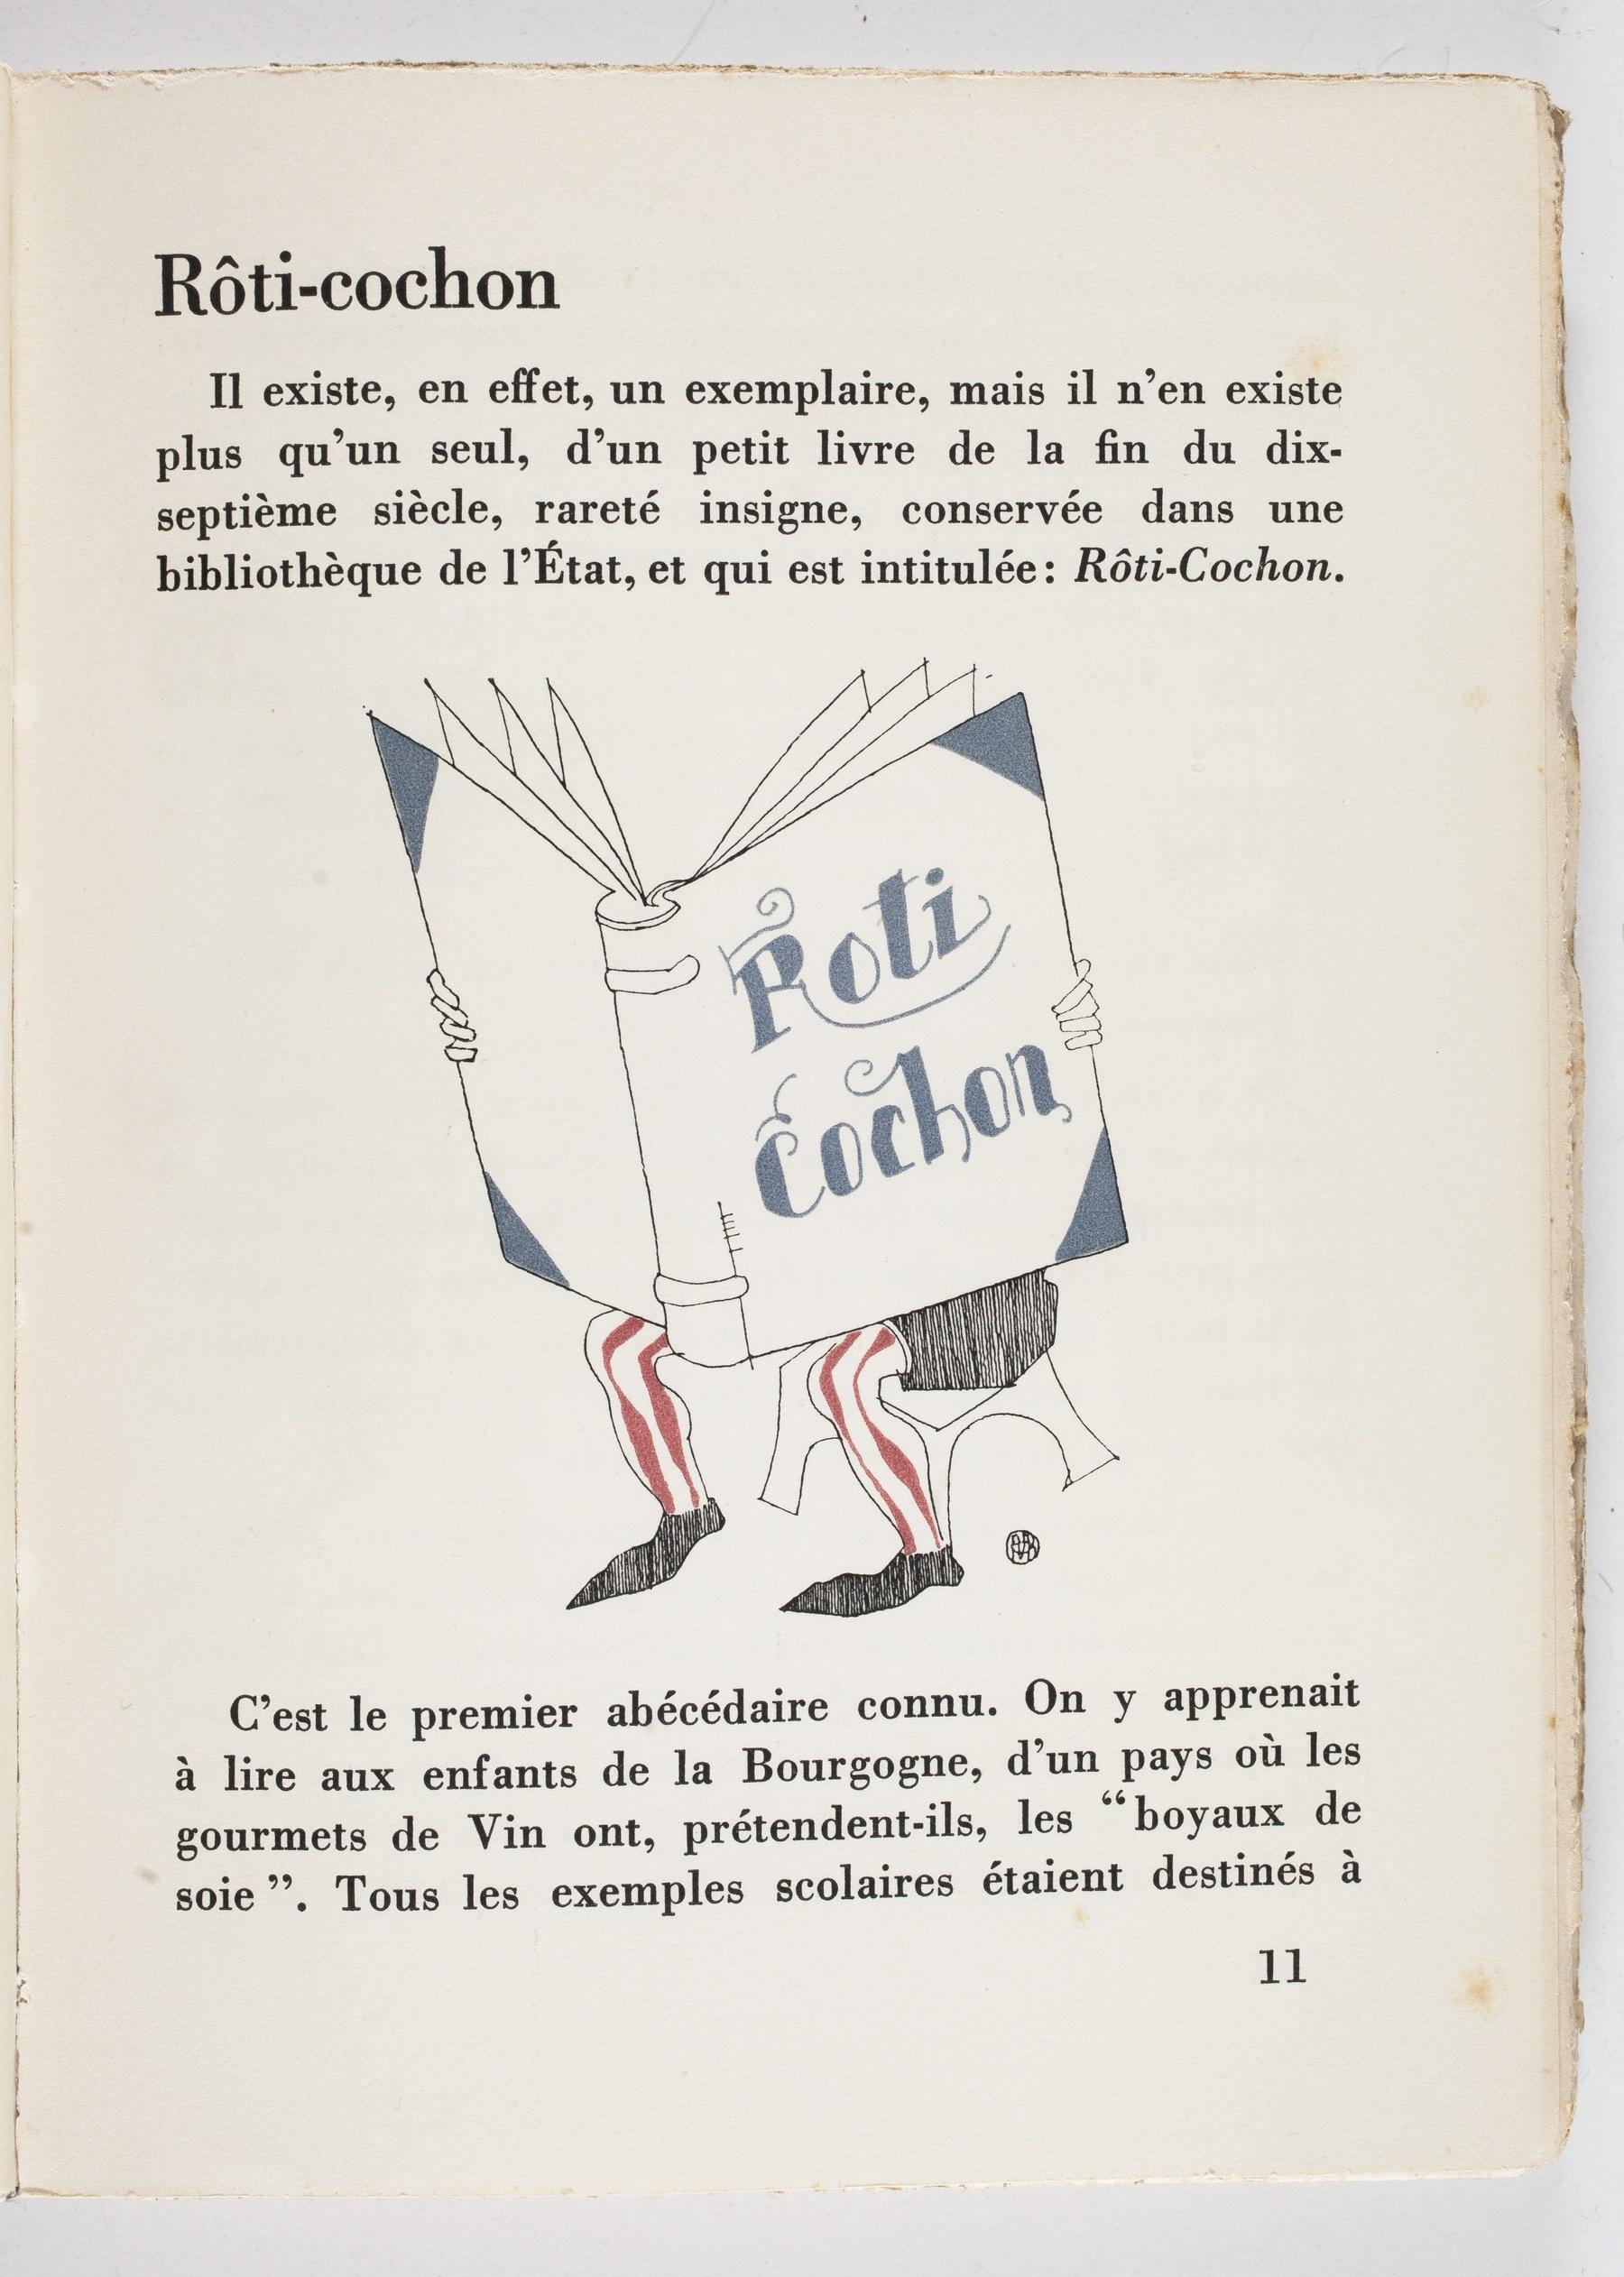 Contenu du Rôti-cochon